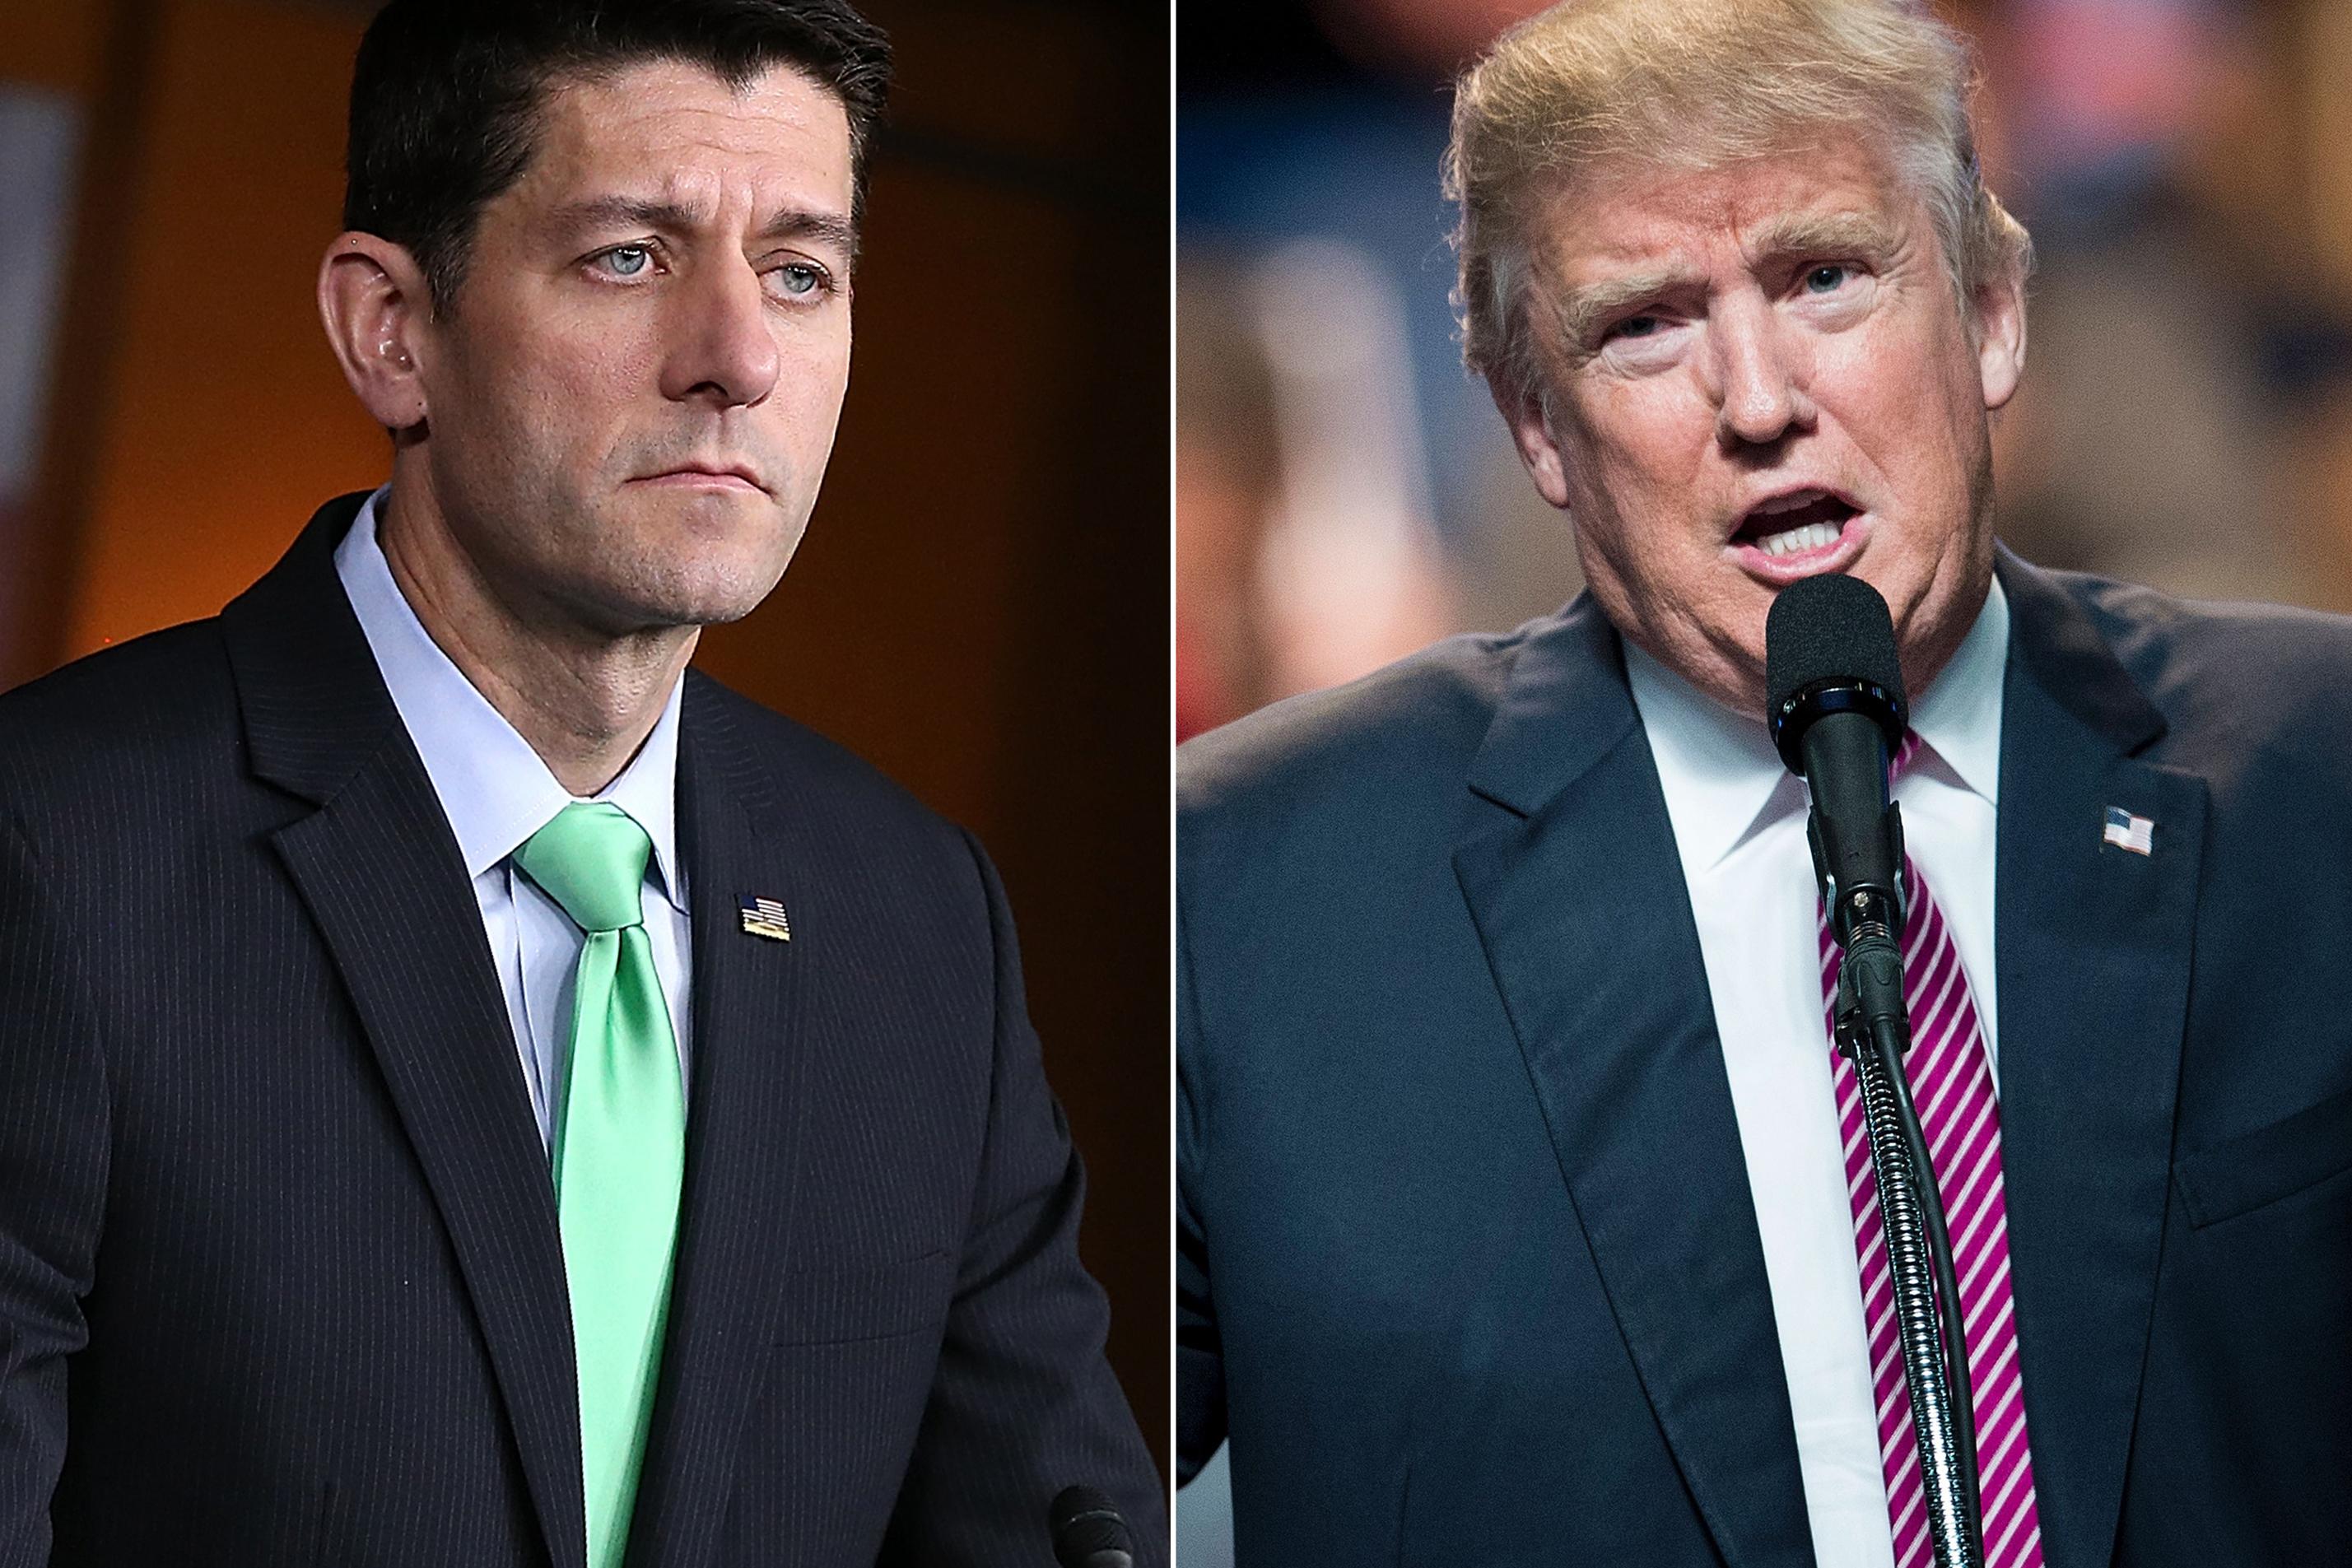 Paul Ryan in Washington, on April 28, 2016 (L); Donald Trump in Charleston, West Virginia, on May 5, 2016.